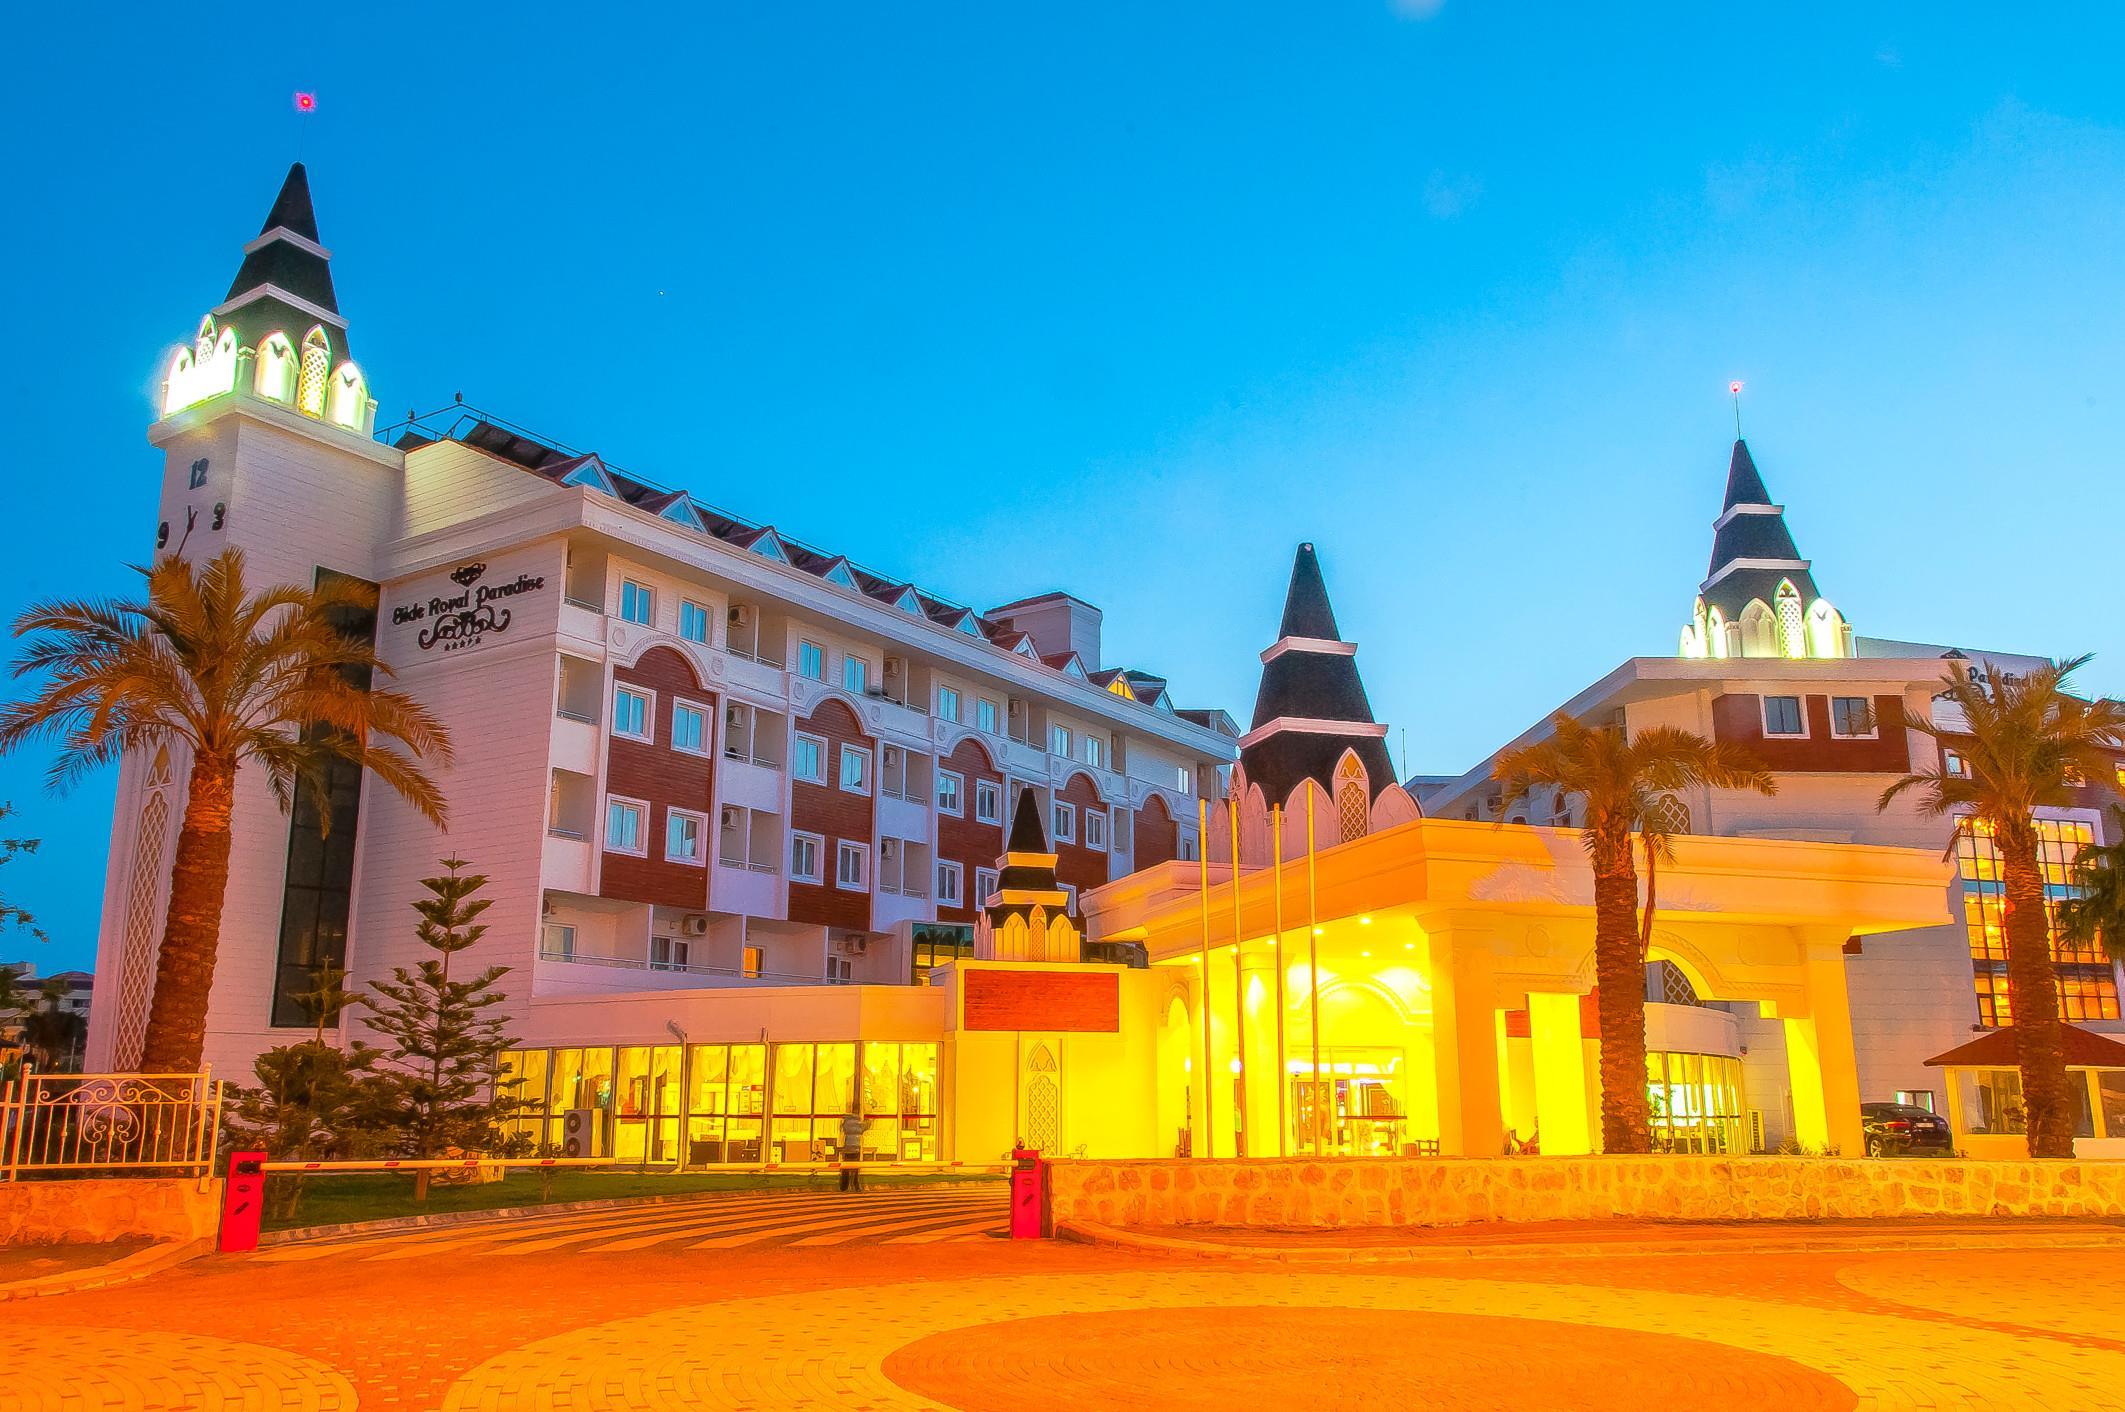 http://www.orextravel.sk/OREX/hotelphotos/side-royal-paradise-general-0038.jpg